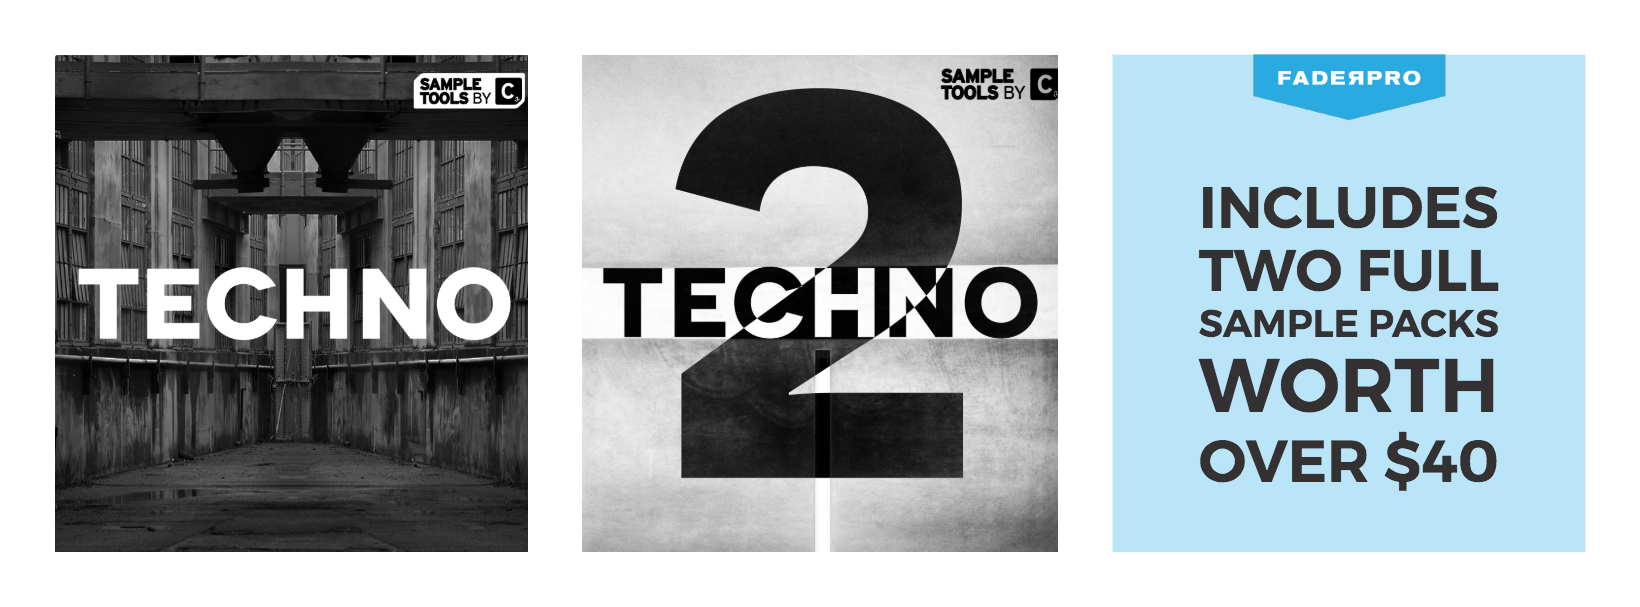 Cr2 Techno Sample pack FaderPro